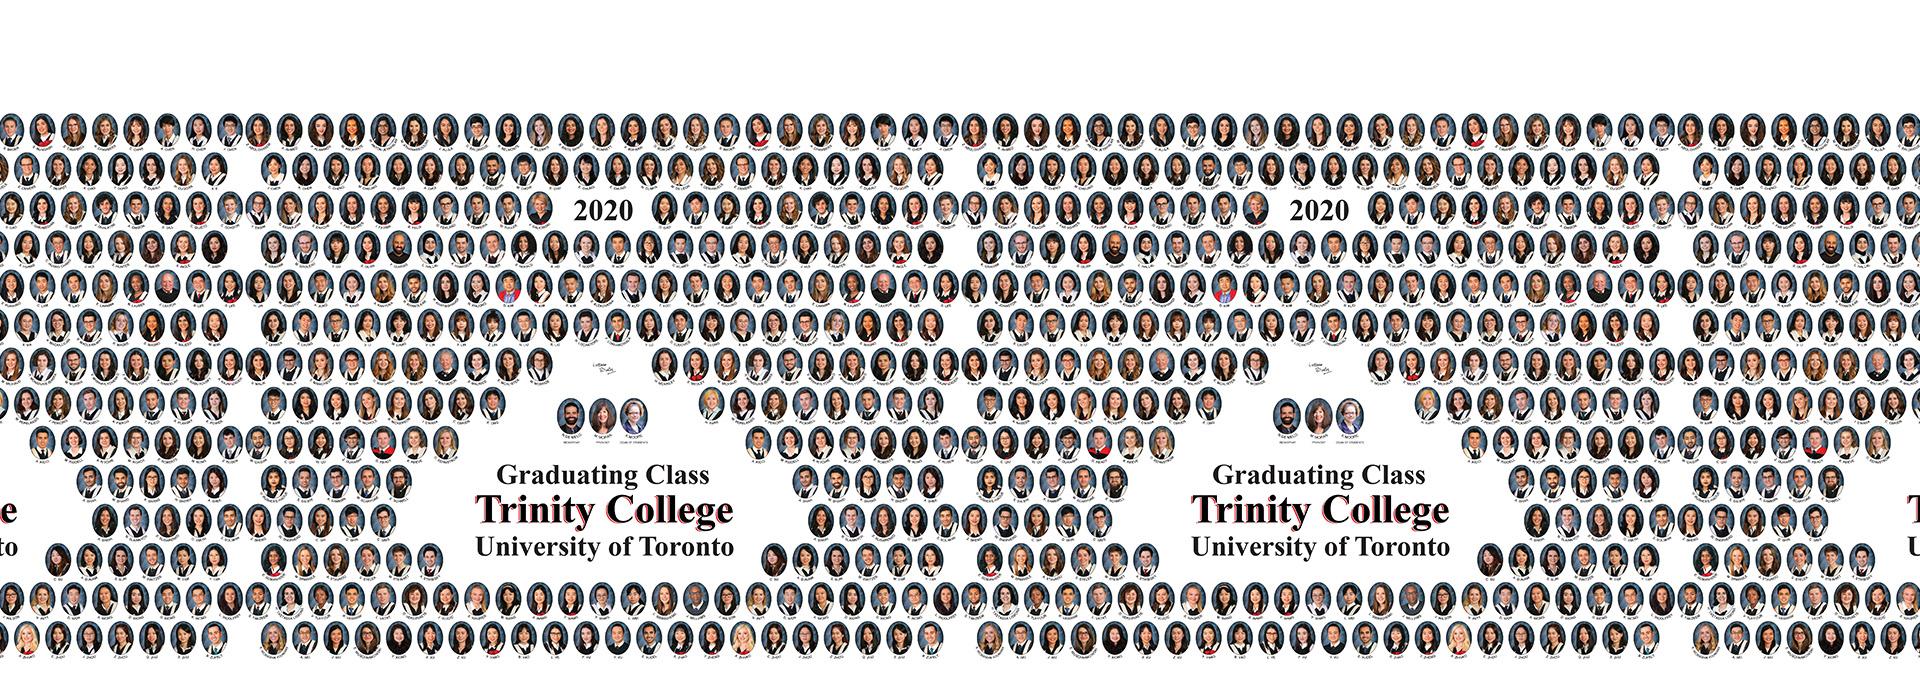 Trinity Class 2020 Graduate Composite